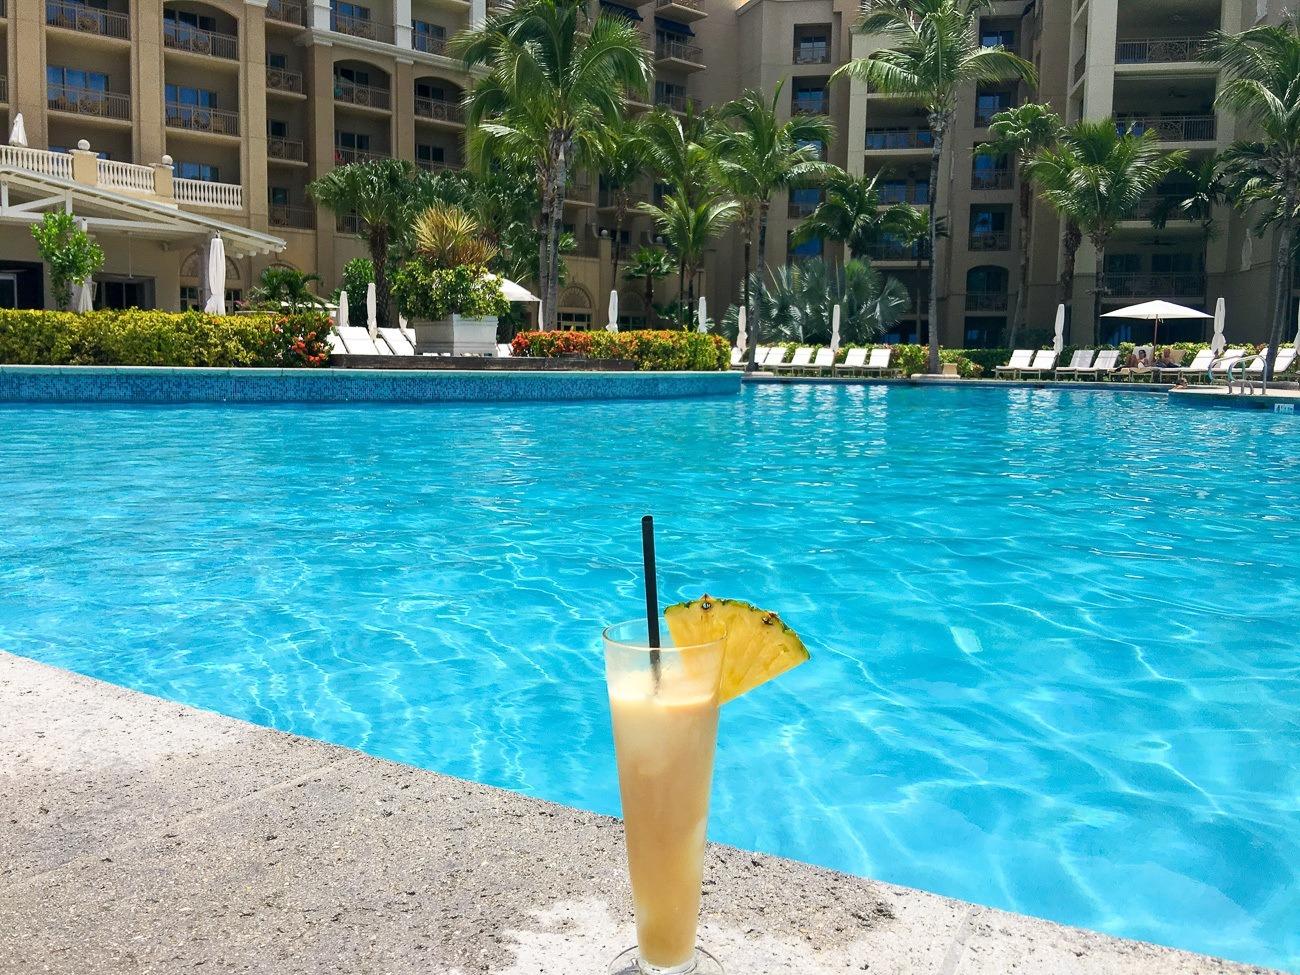 A pià±a colada at The Ritz-Carlton Grand Cayman pool